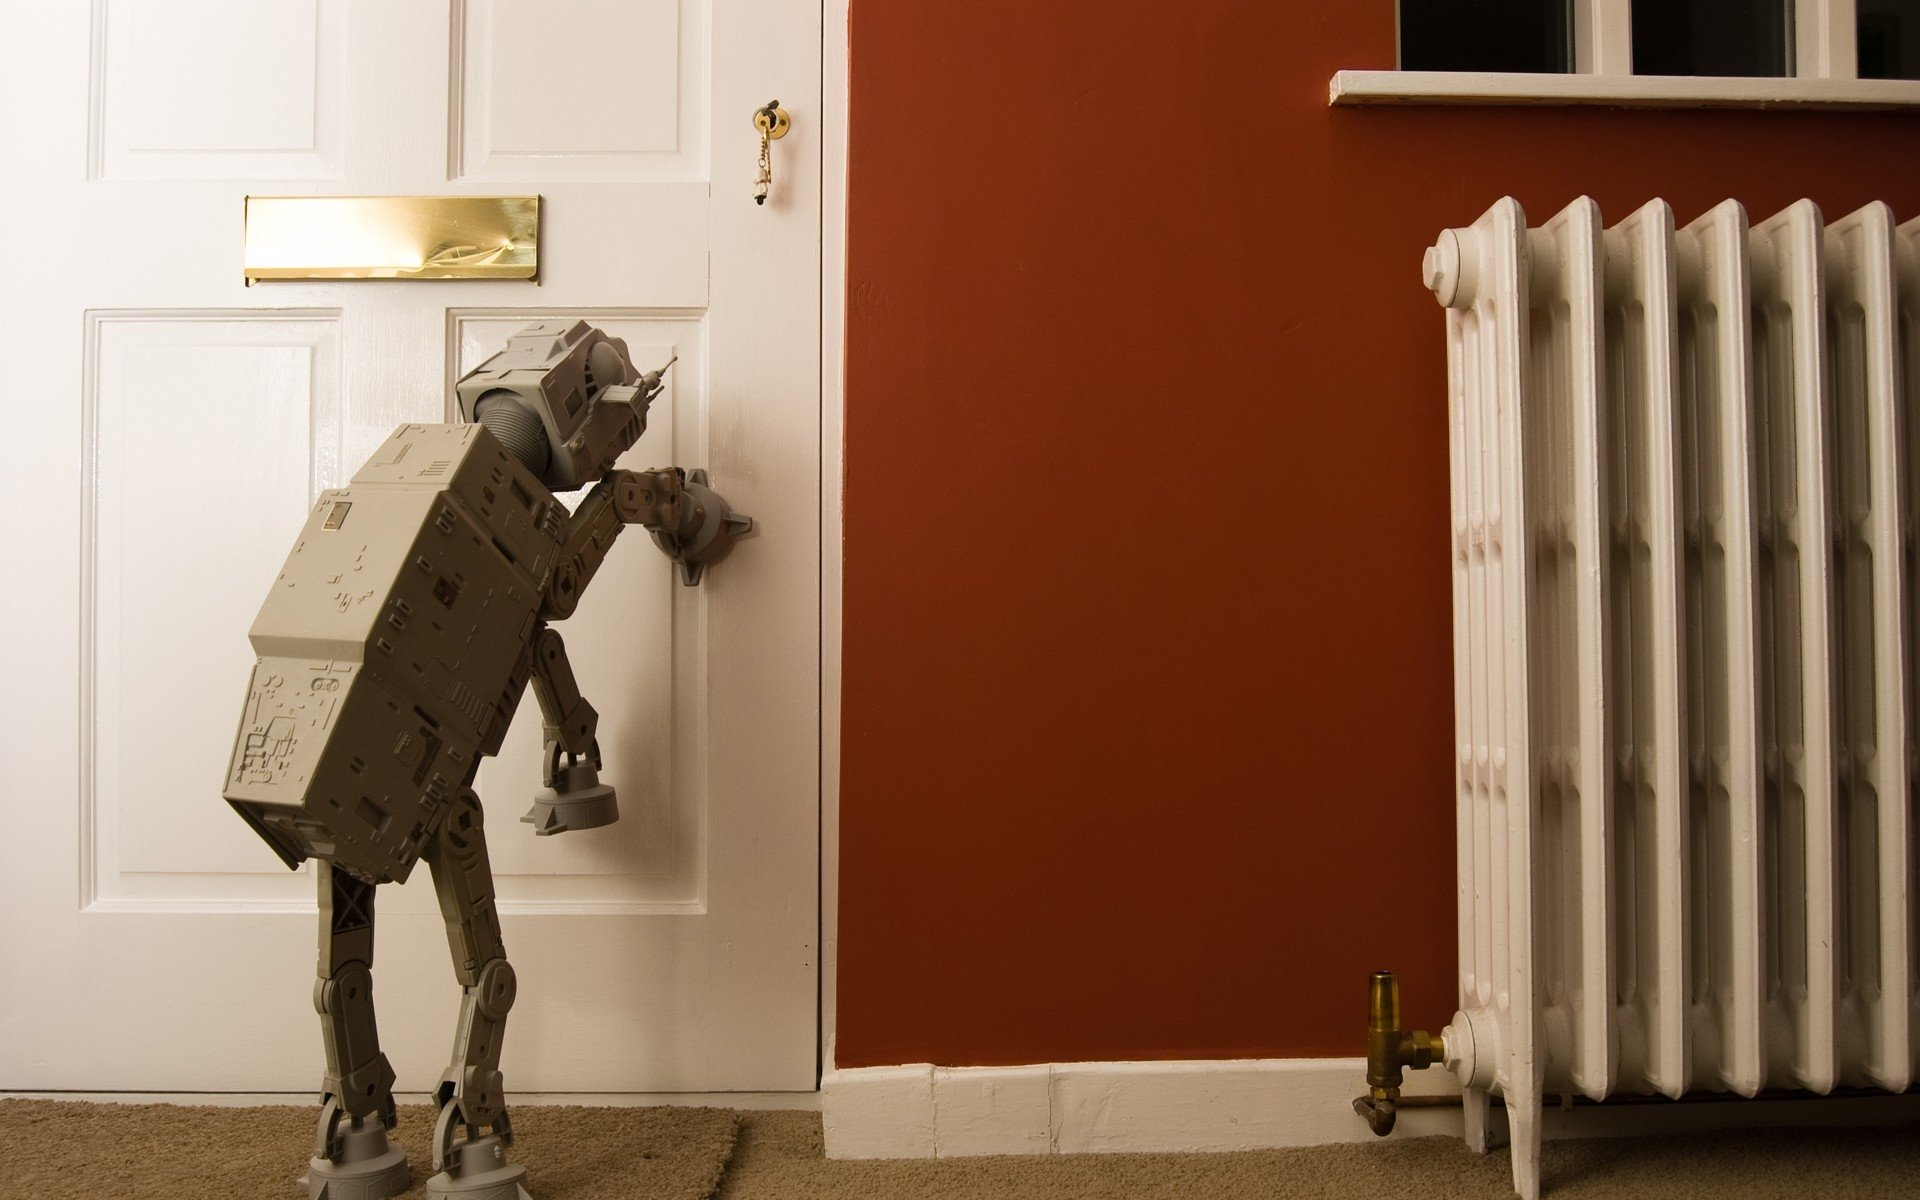 amusant full hd fond d 39 cran and arri re plan 1920x1200 id 191759. Black Bedroom Furniture Sets. Home Design Ideas